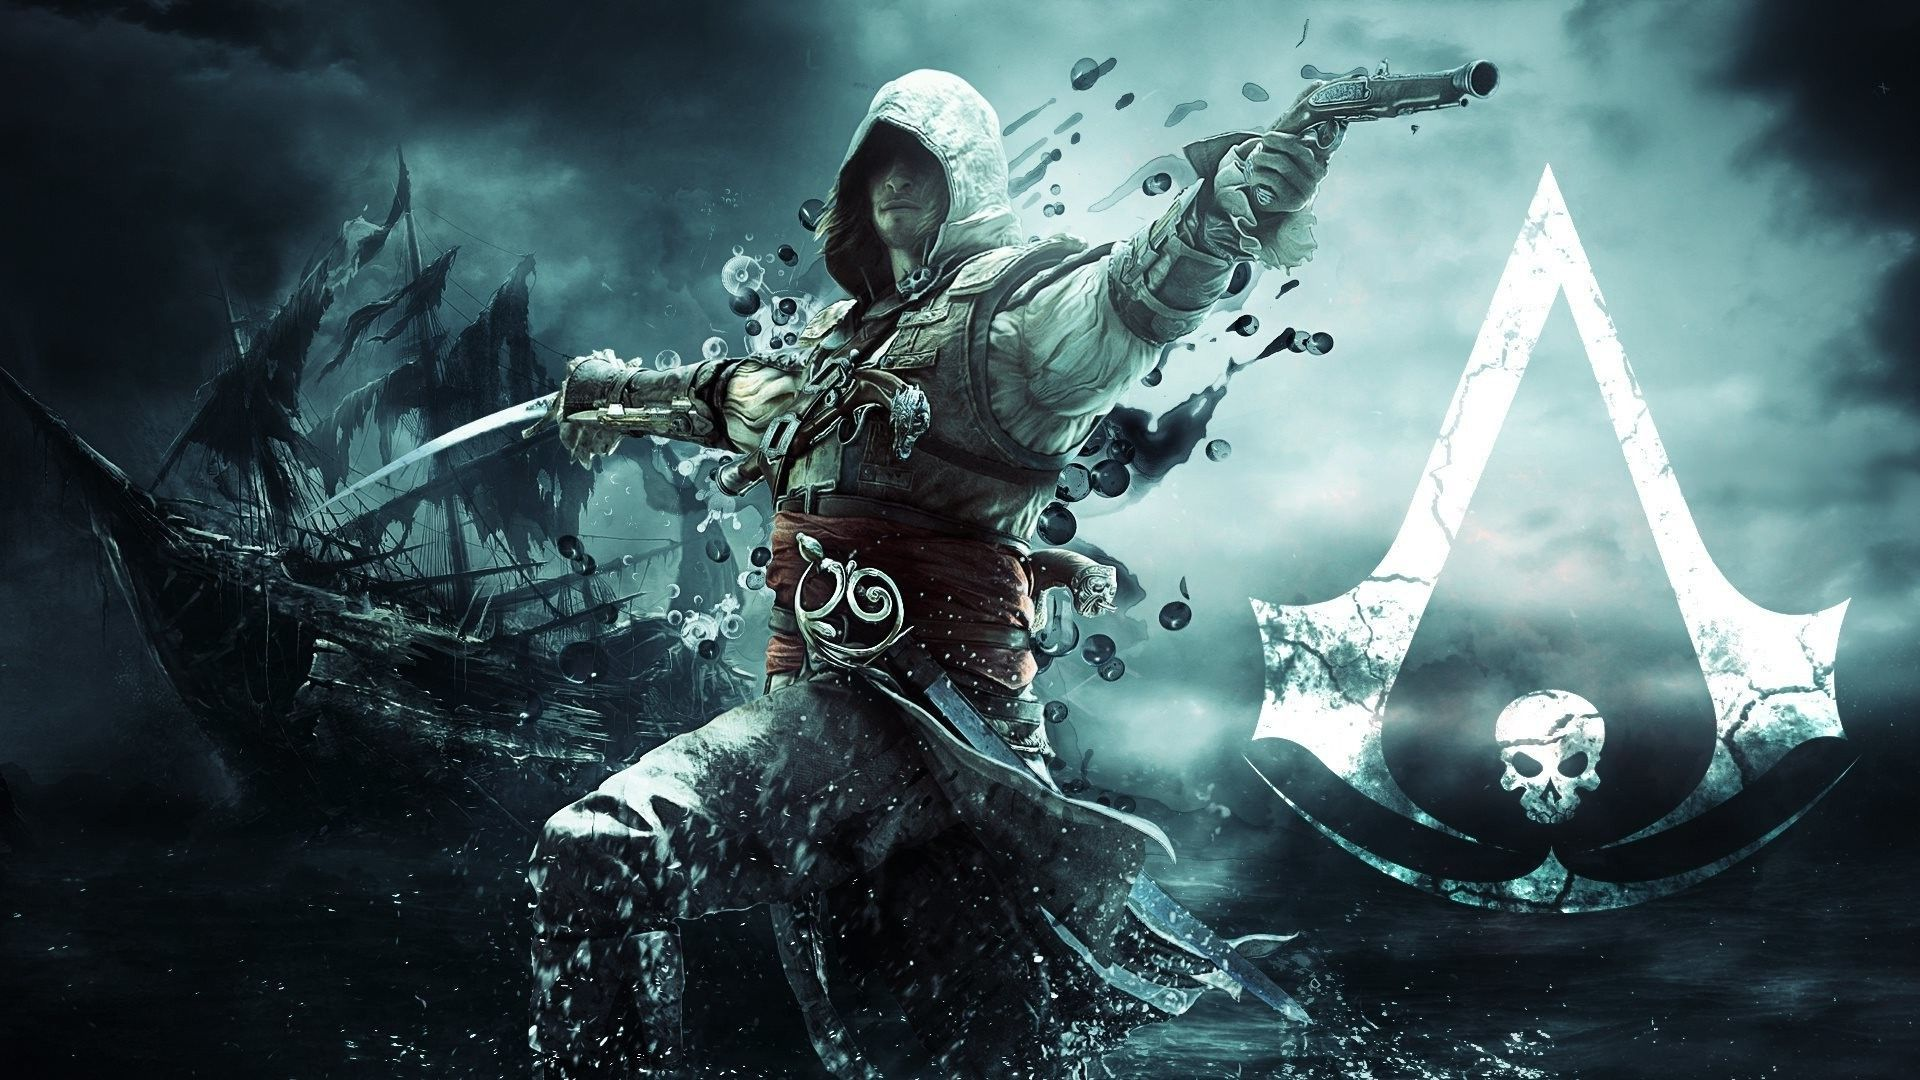 Video Games Assassins Creed Assassins Creed Black Flag Wallpaper Assassins Creed Black Flag Assassin S Creed Wallpaper Black Flag